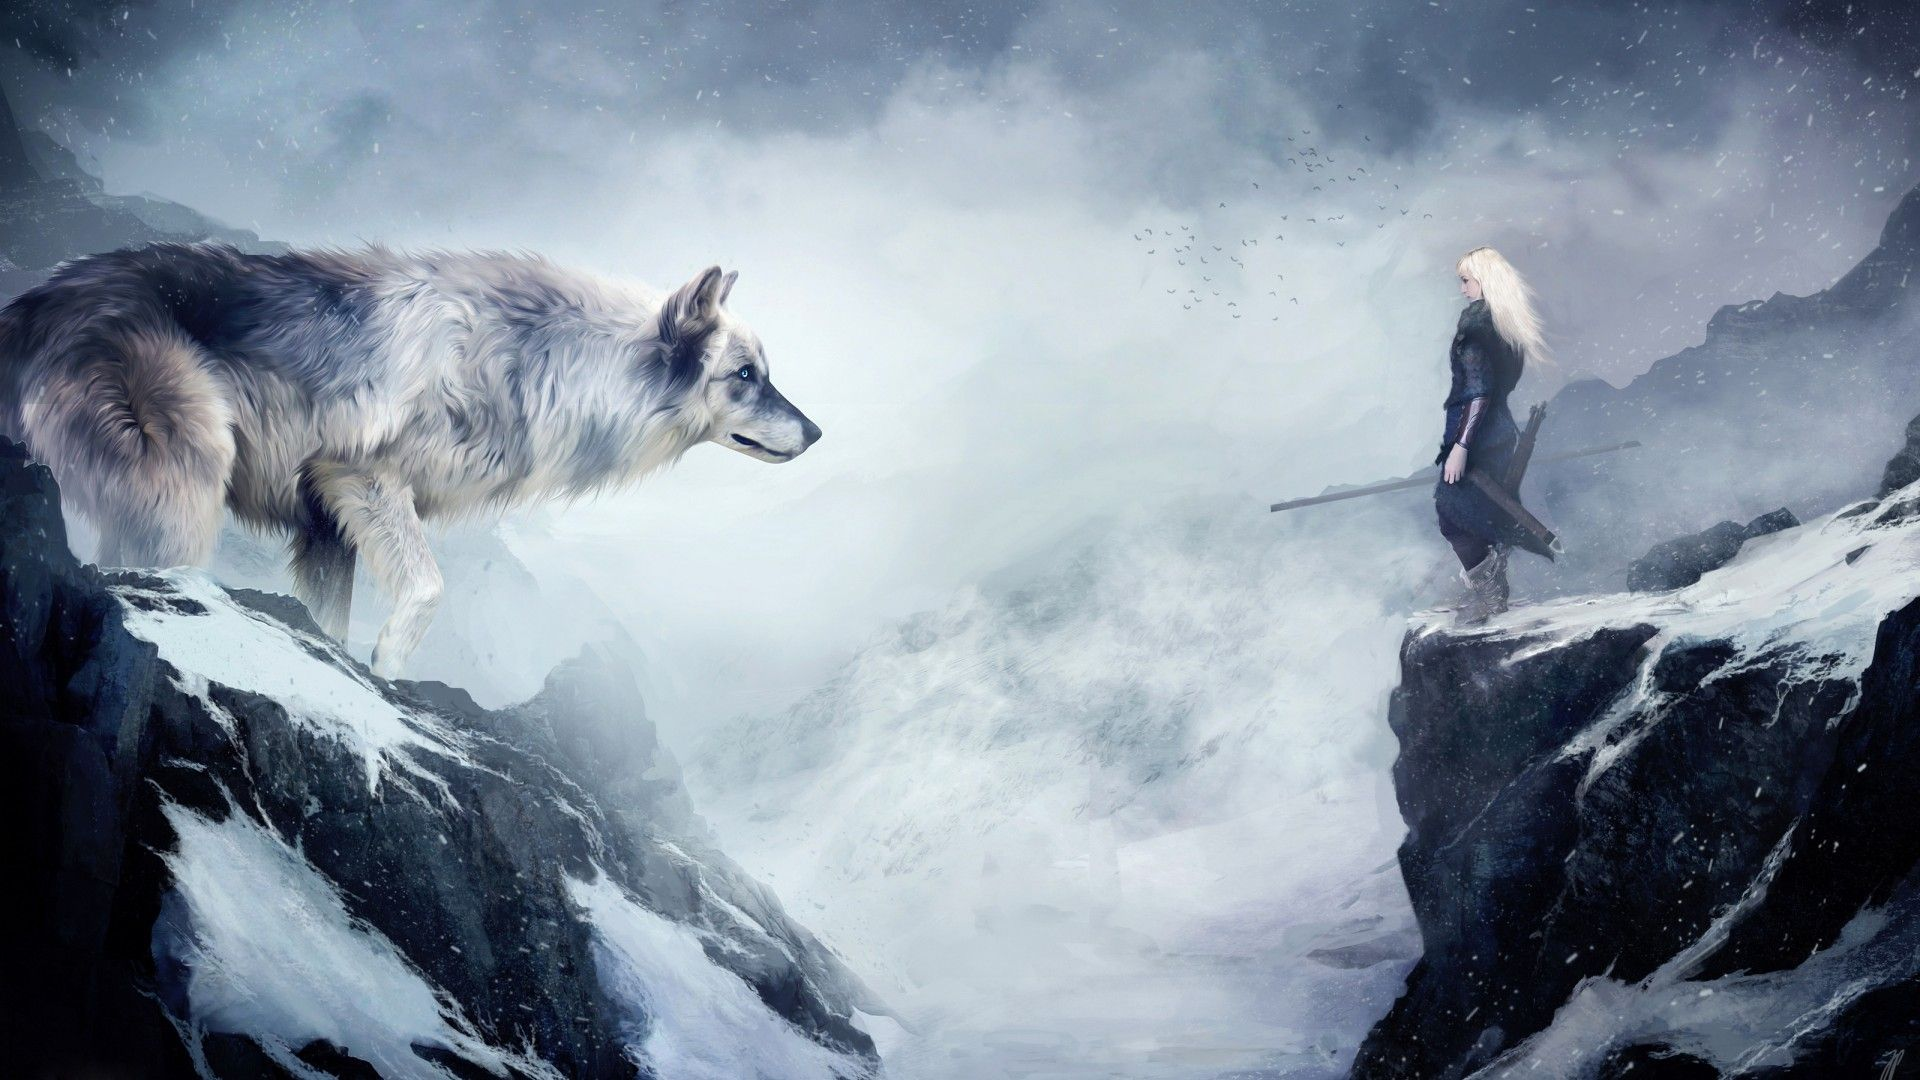 Wallpaper Wolf 4k Hd Wallpaper Mountain Girl Animals Winter Drawing Snow Fantasy Art Os 937 Fantasy Wolf Wolf Wallpaper Wolf Warriors